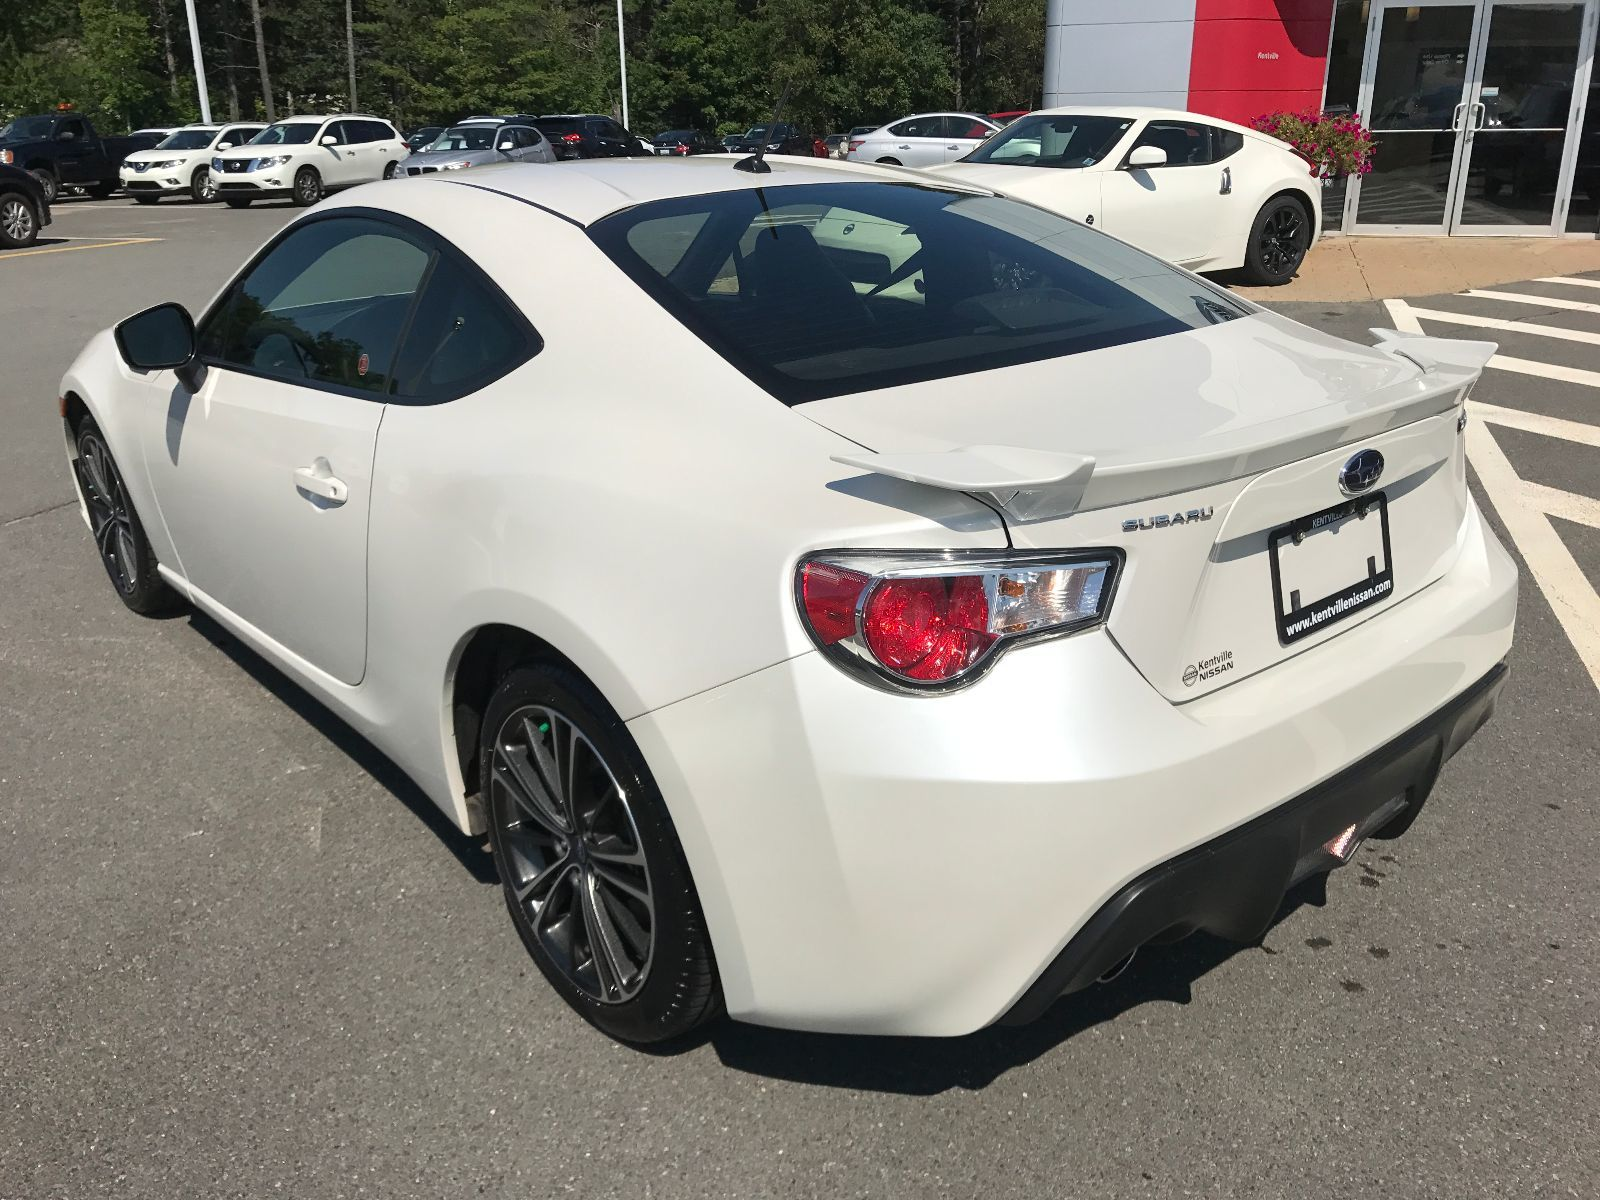 902 Auto Sales Used 2013 Subaru Brz For Sale In Dartmouth Kn 489